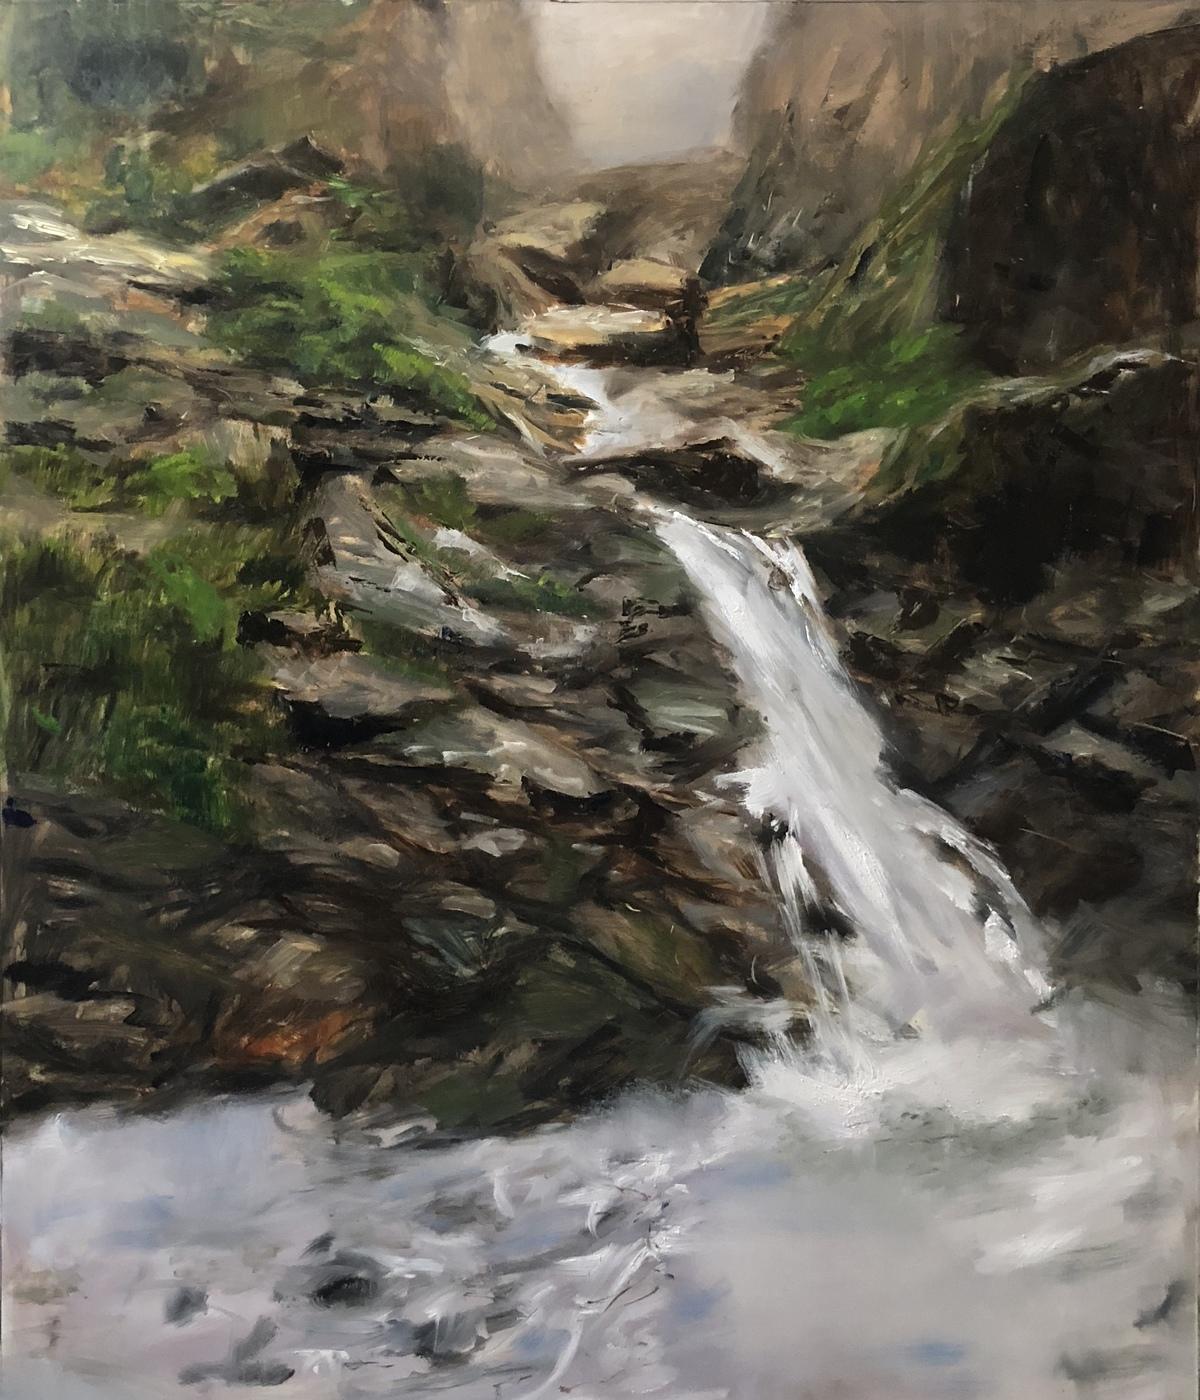 Ebb and Flow by Abhinaya Ramadurai, Image Painting, Oil on Linen,